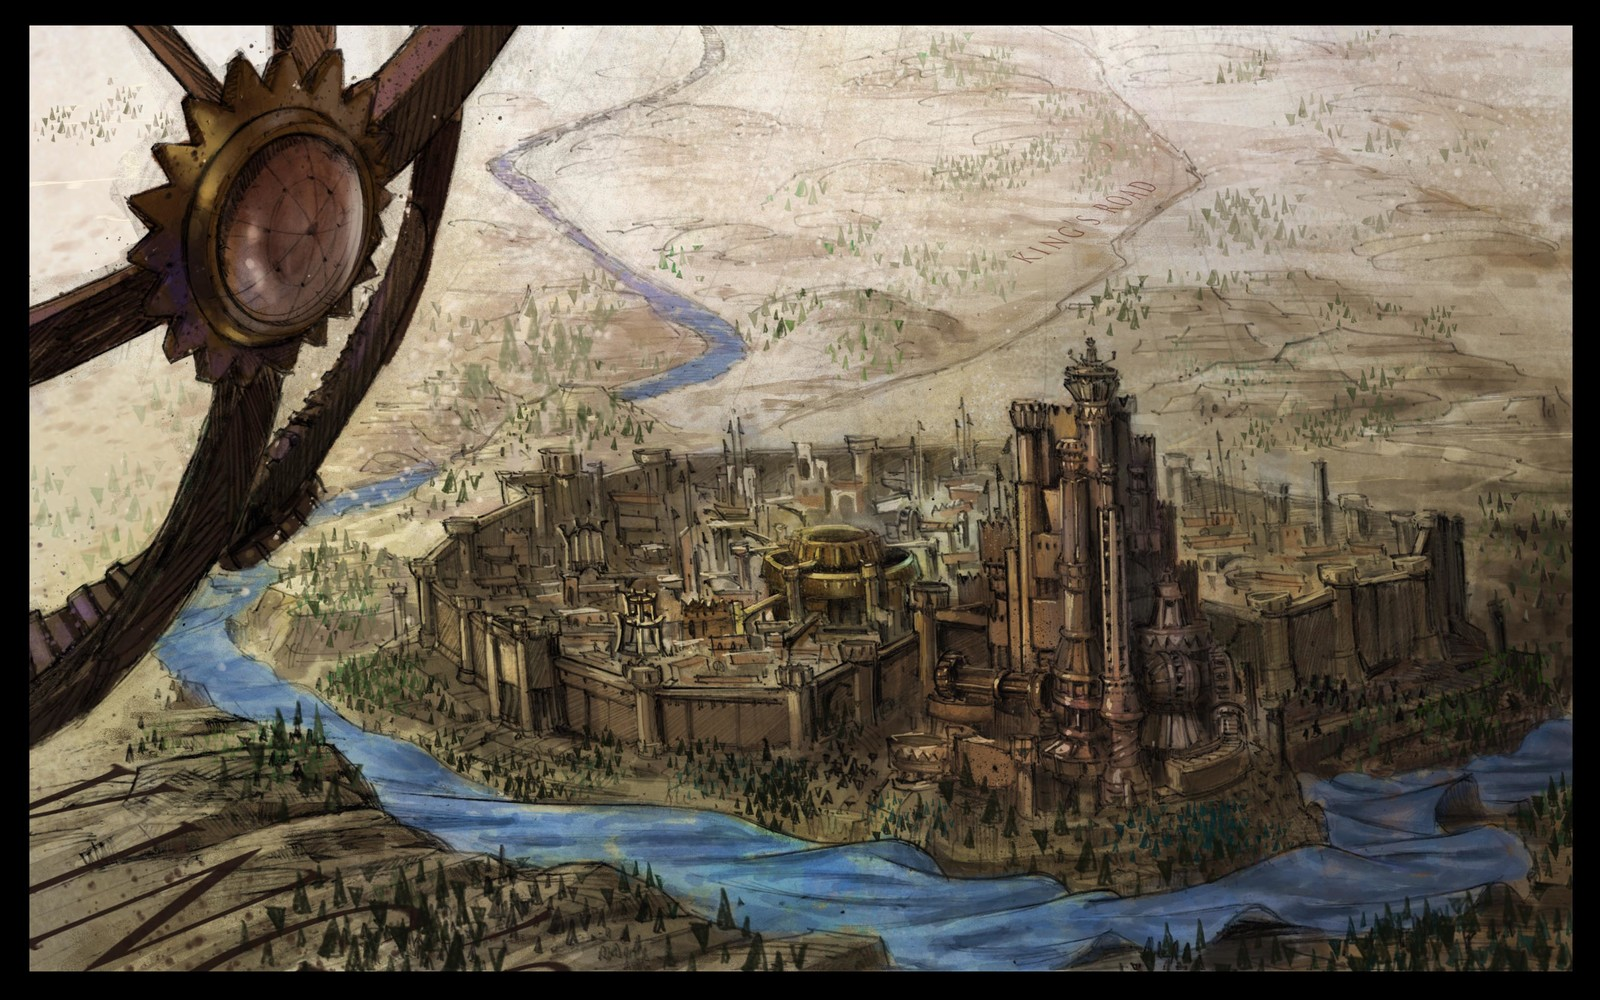 Game of Thrones Intro, King's Landing Development